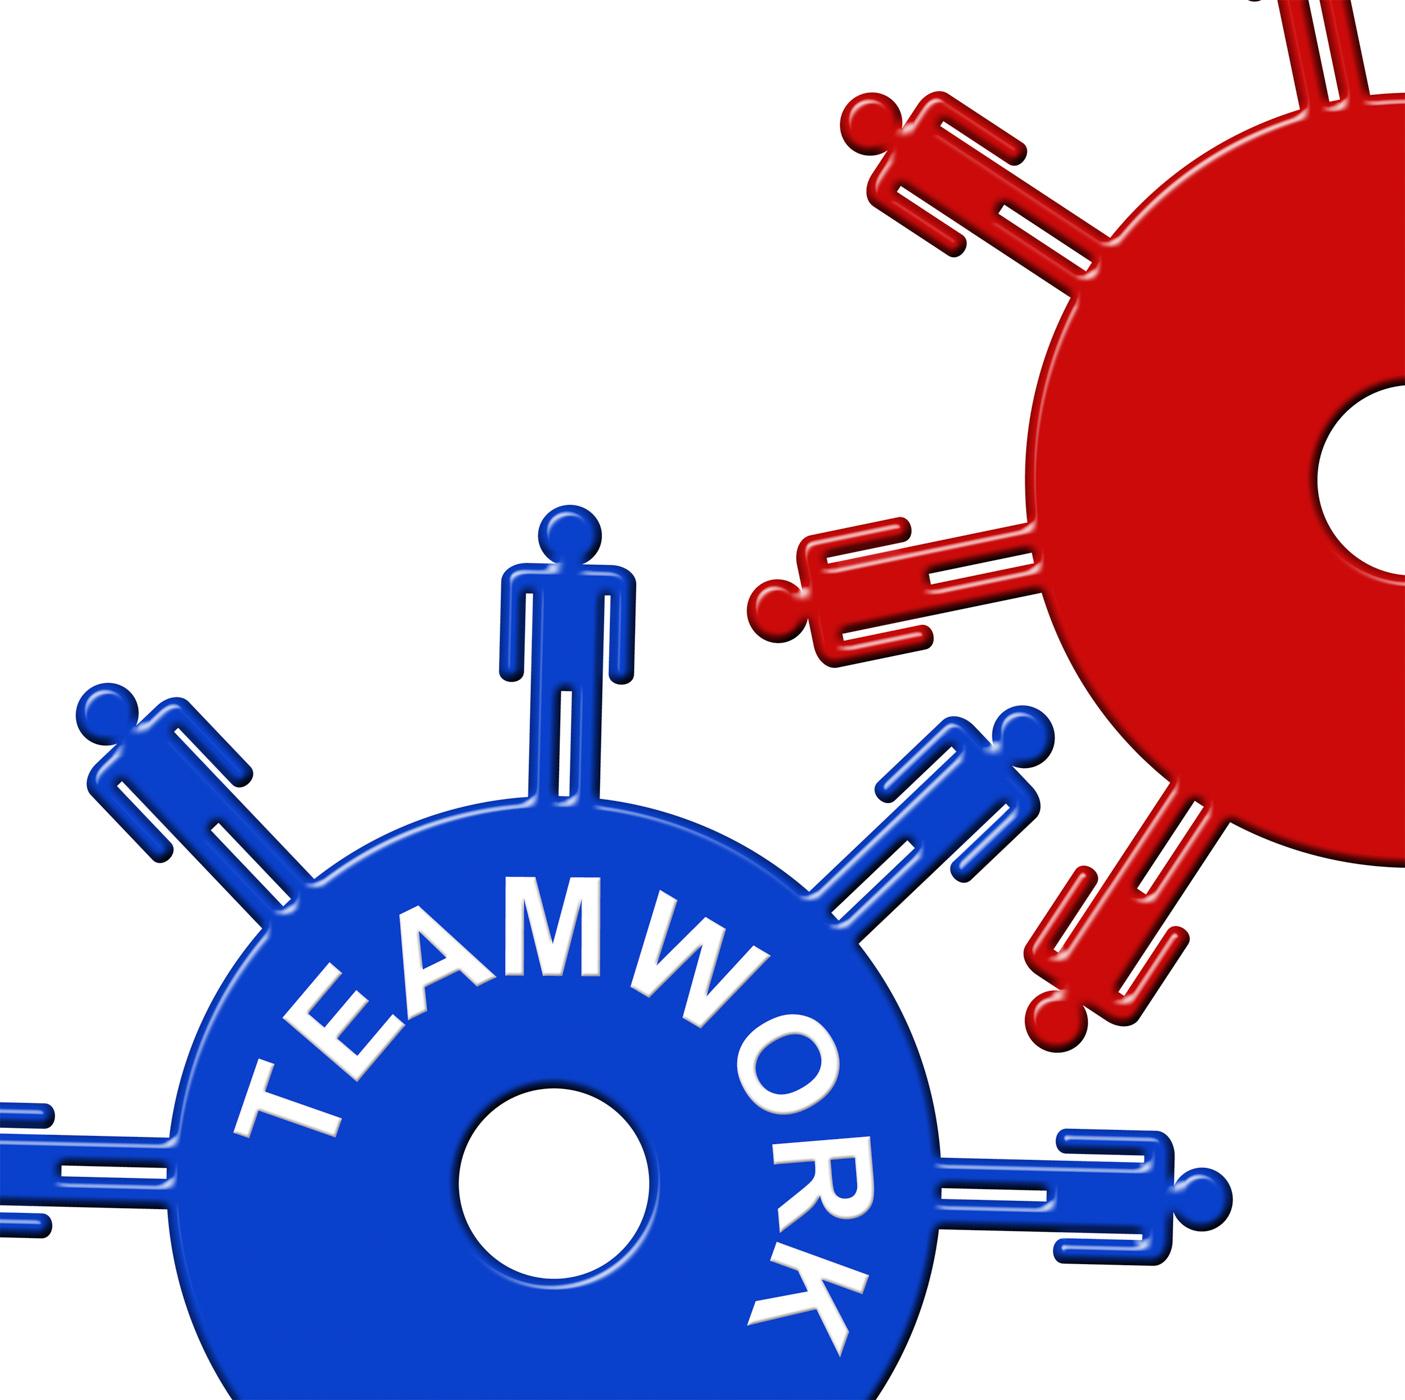 Teamwork cogs shows gear wheel and clockwork photo